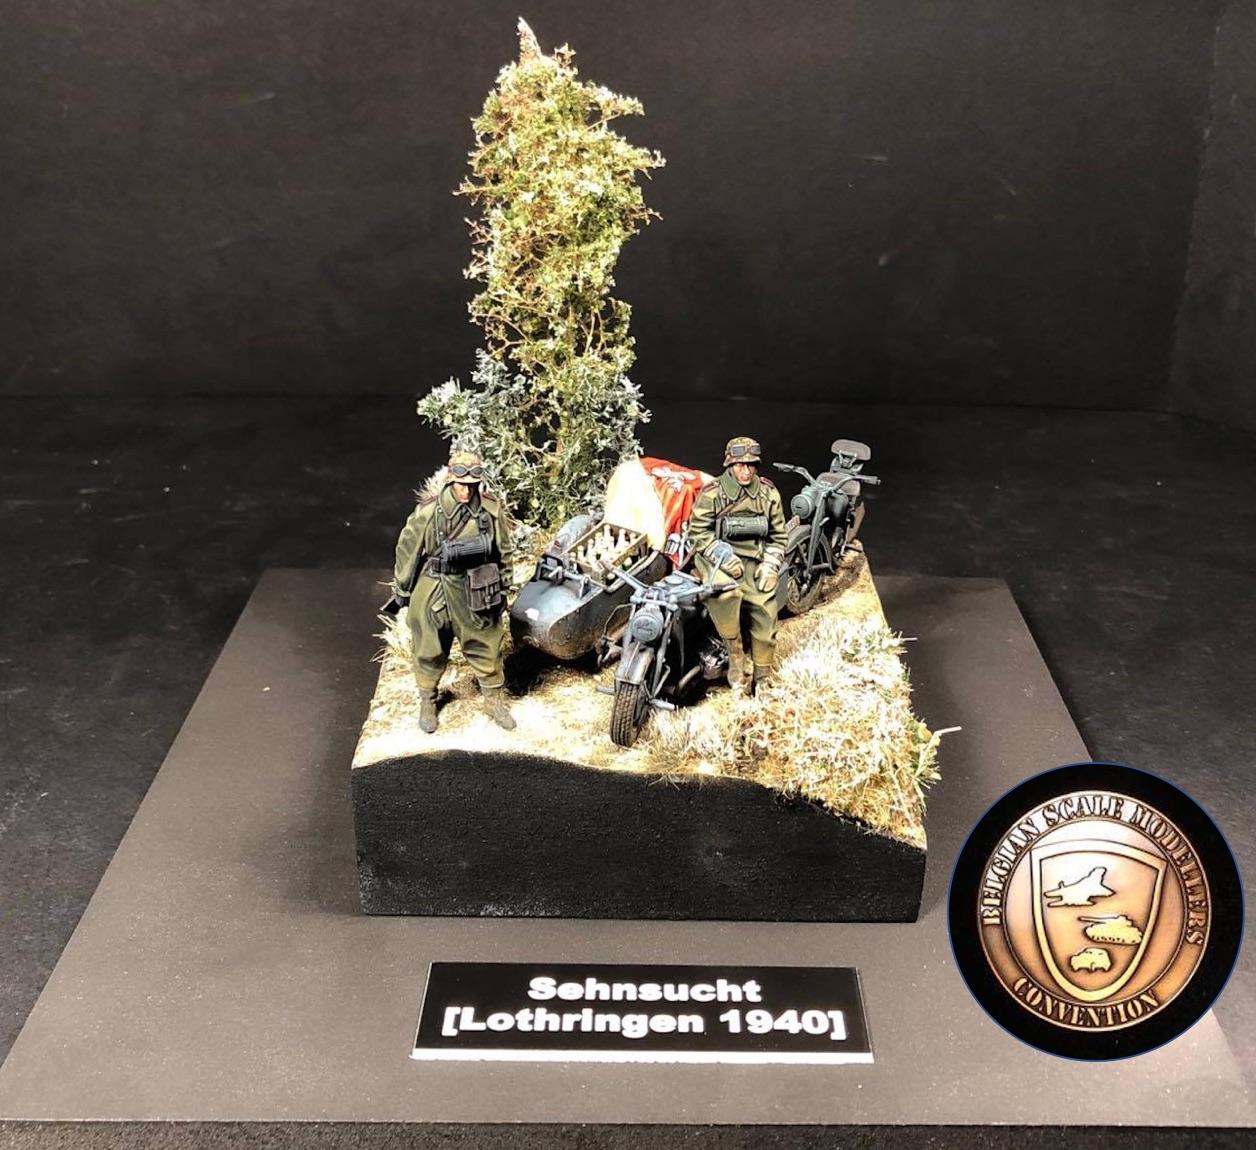 Zündapp KS750 - Sidecar - Great Wall Hobby + figurines Alpine - 1/35 - Page 6 203609SehnsuchtBSMCMasterBronze2017